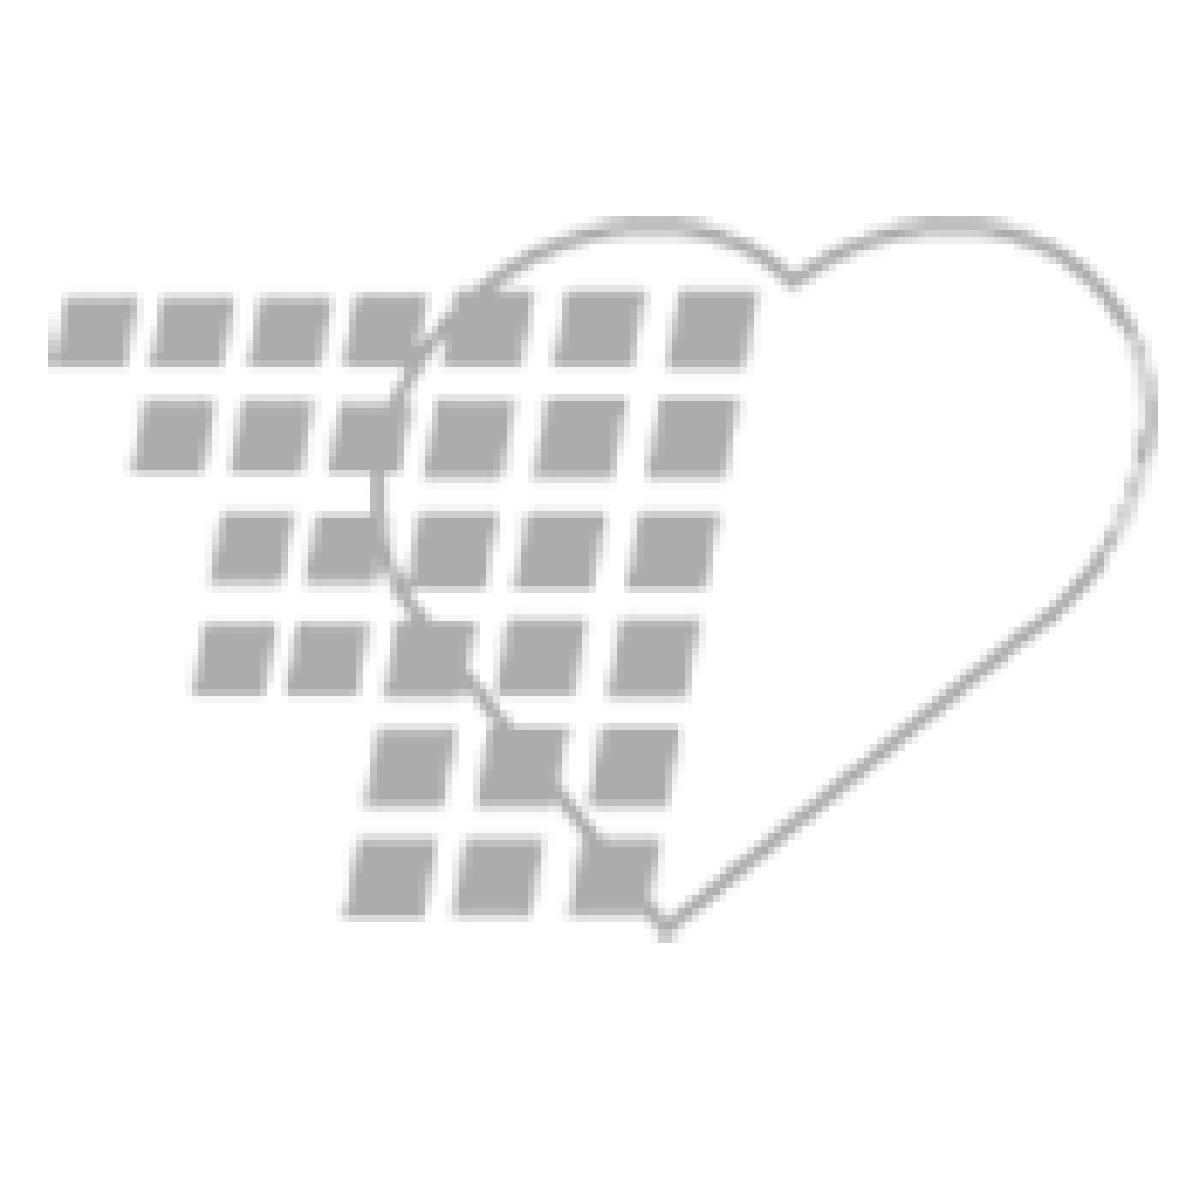 11-81-0914 Cardionics SimShirt Only